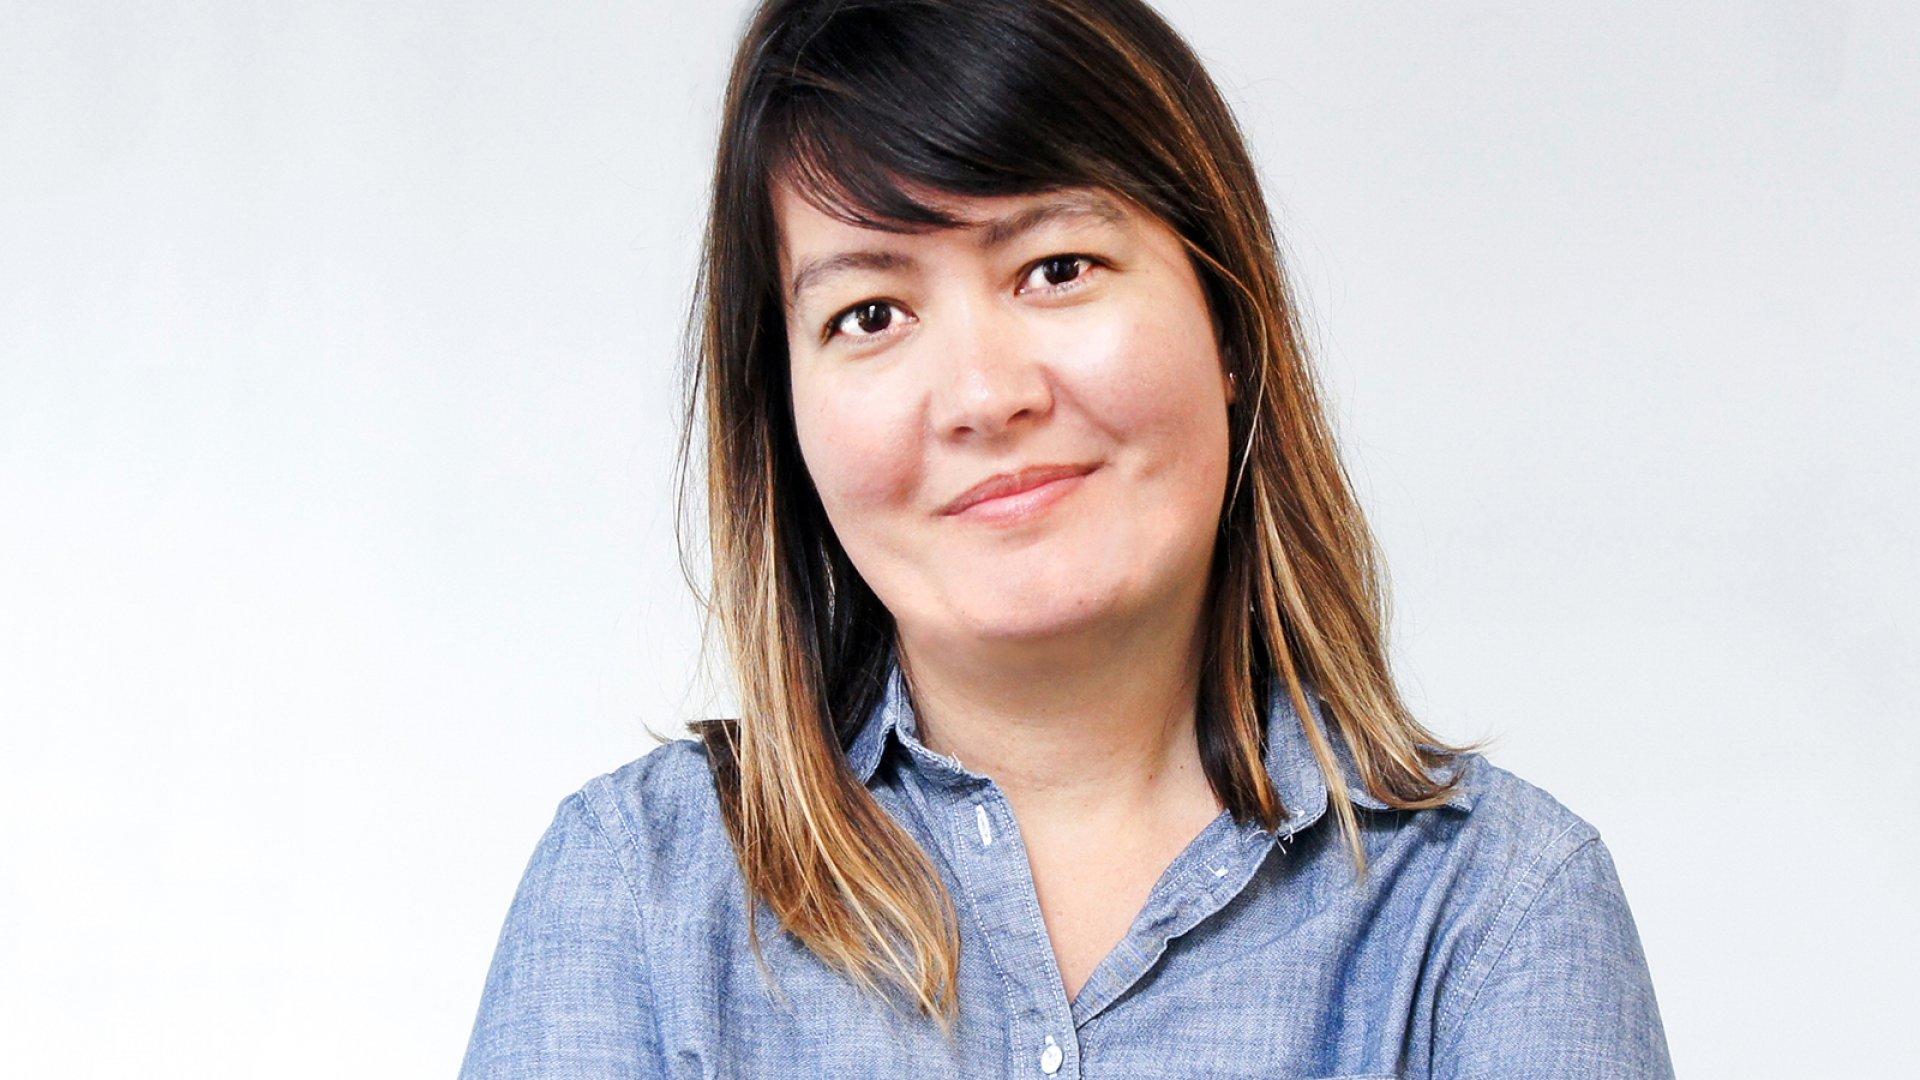 Policygenius co-founder Jennifer Fitzgerald.